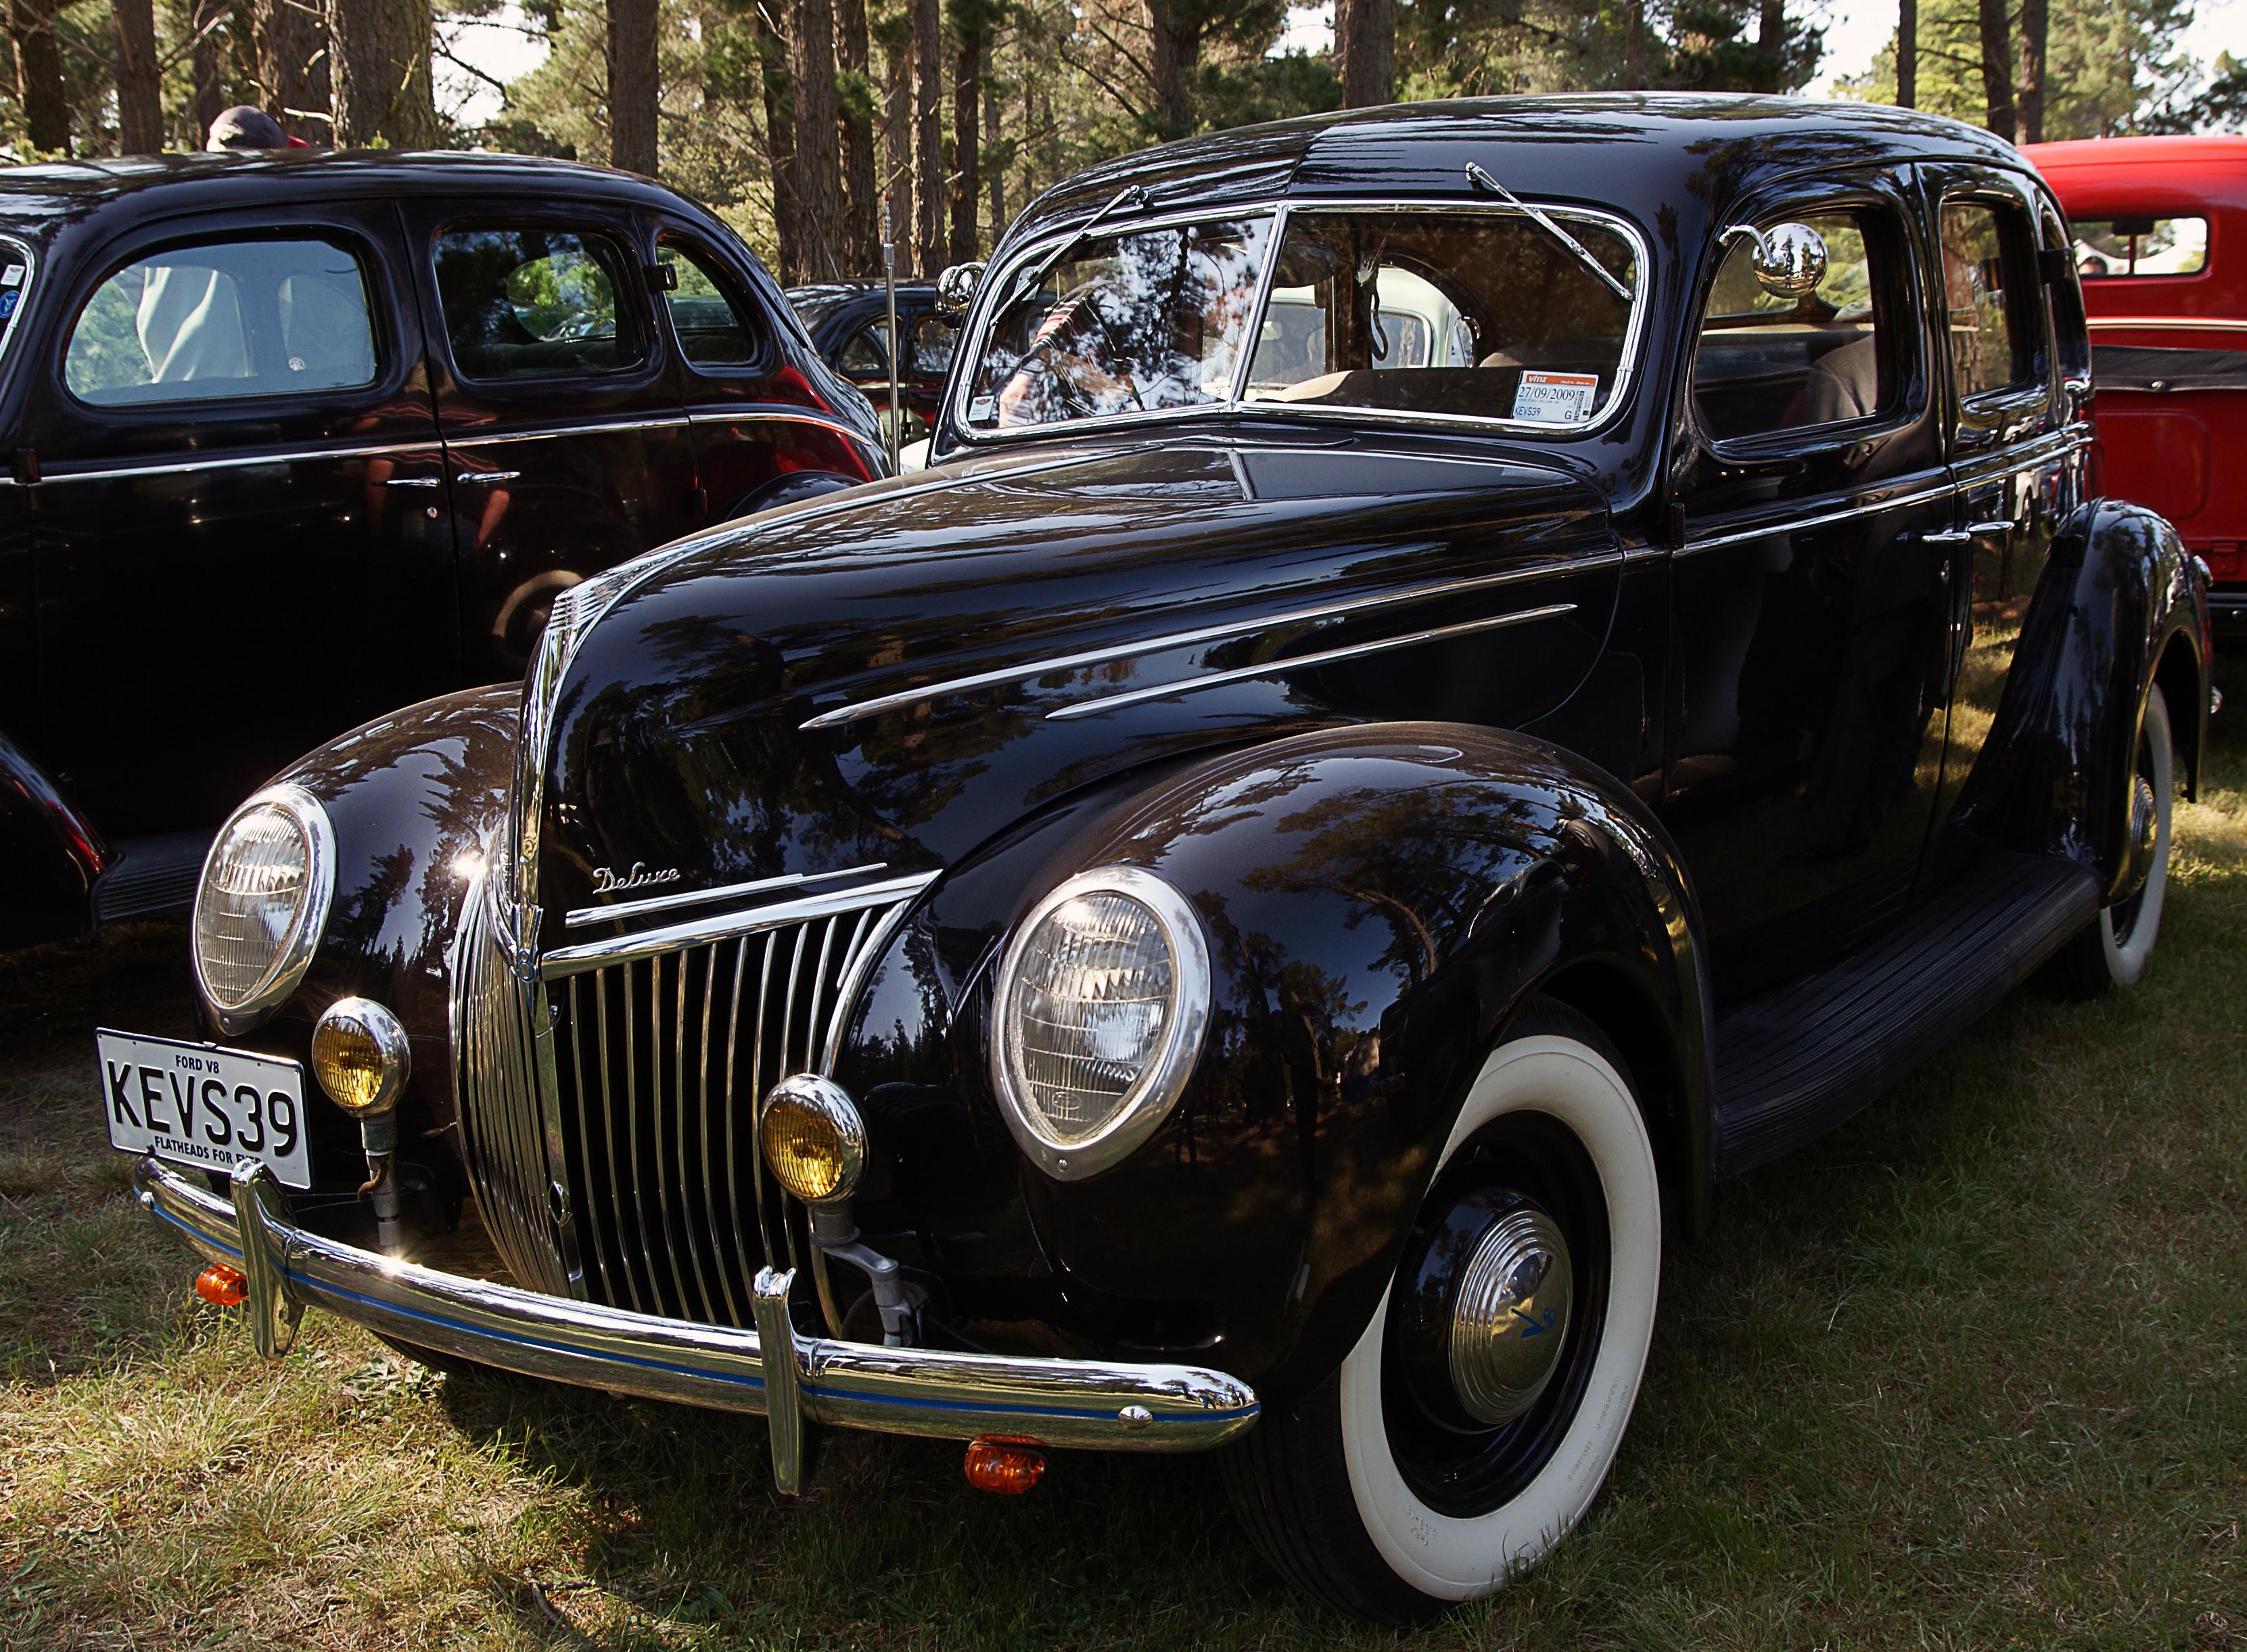 1938 Ford De Lux V8, Car, Free photos, Geo-Tagged, Lines, HQ Photo